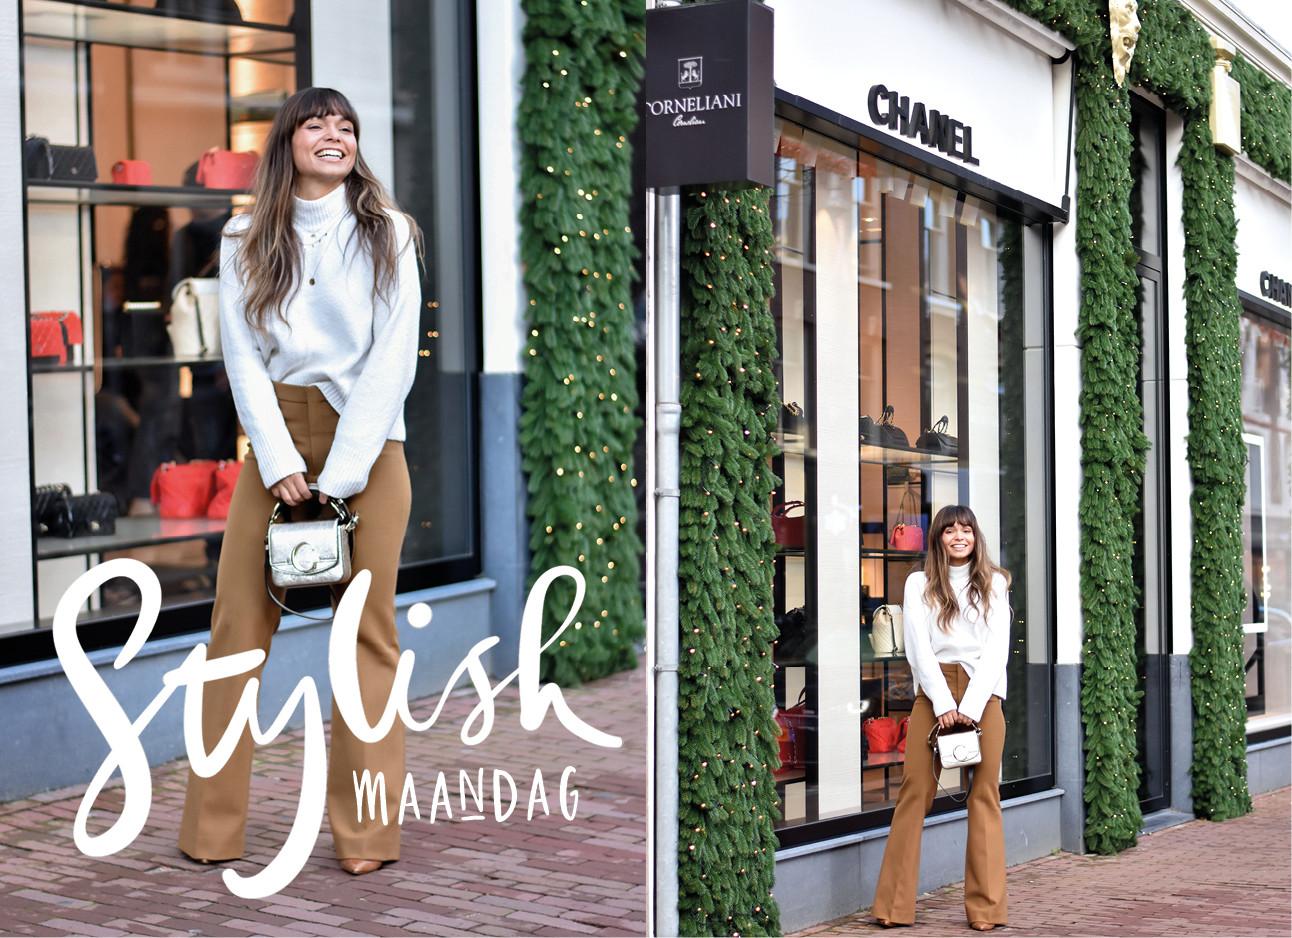 Kiki die in witte trui lachend voor de chanel winkel staat